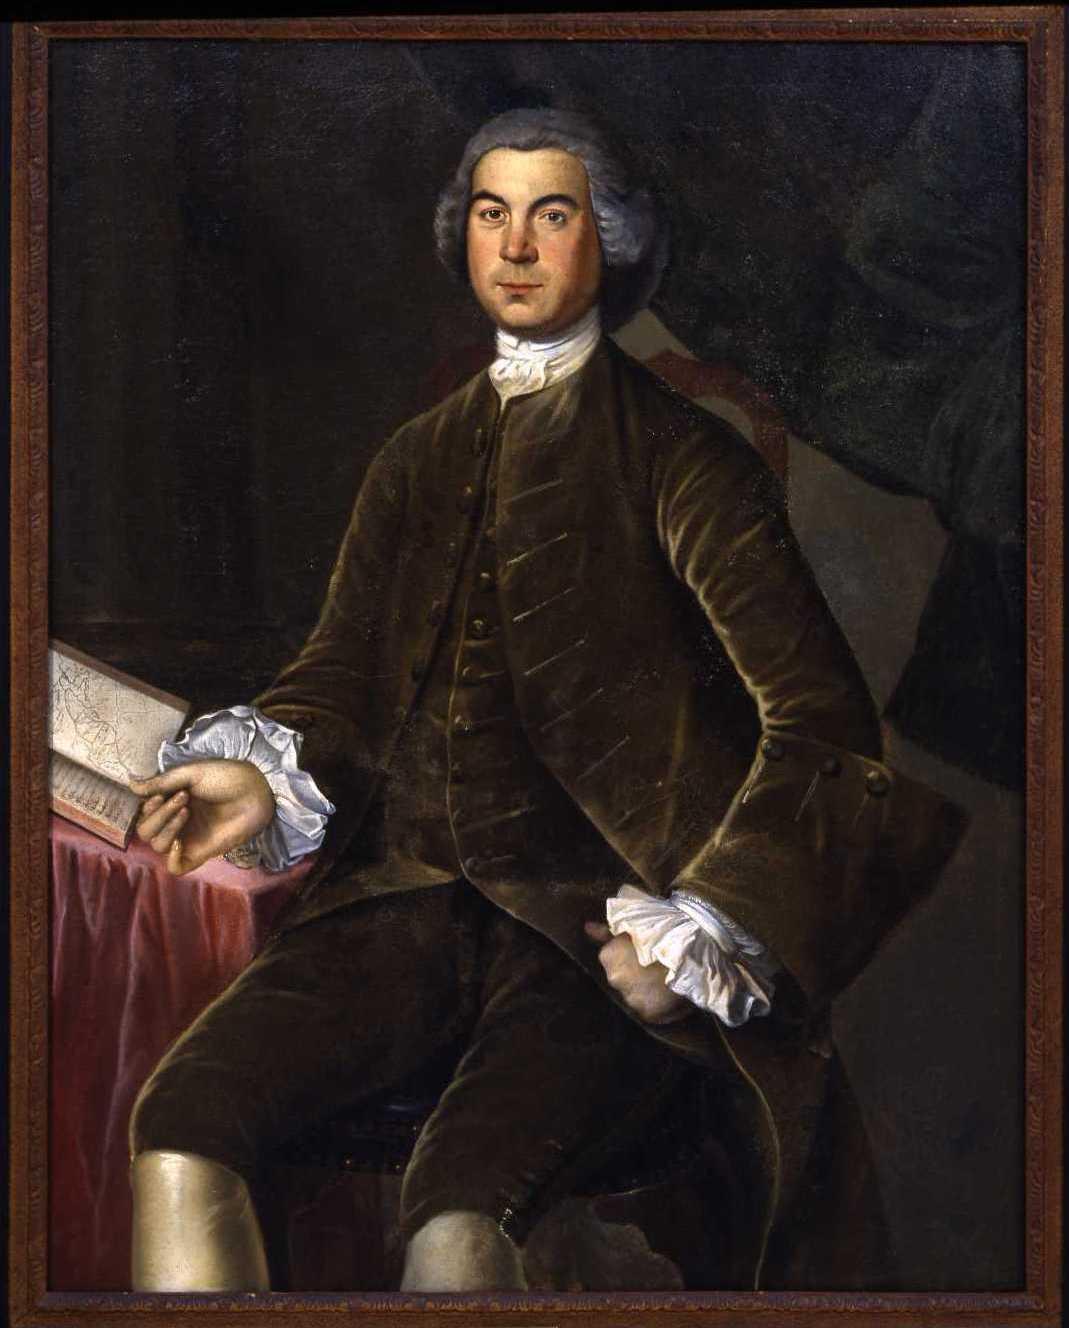 Thomas Marshall